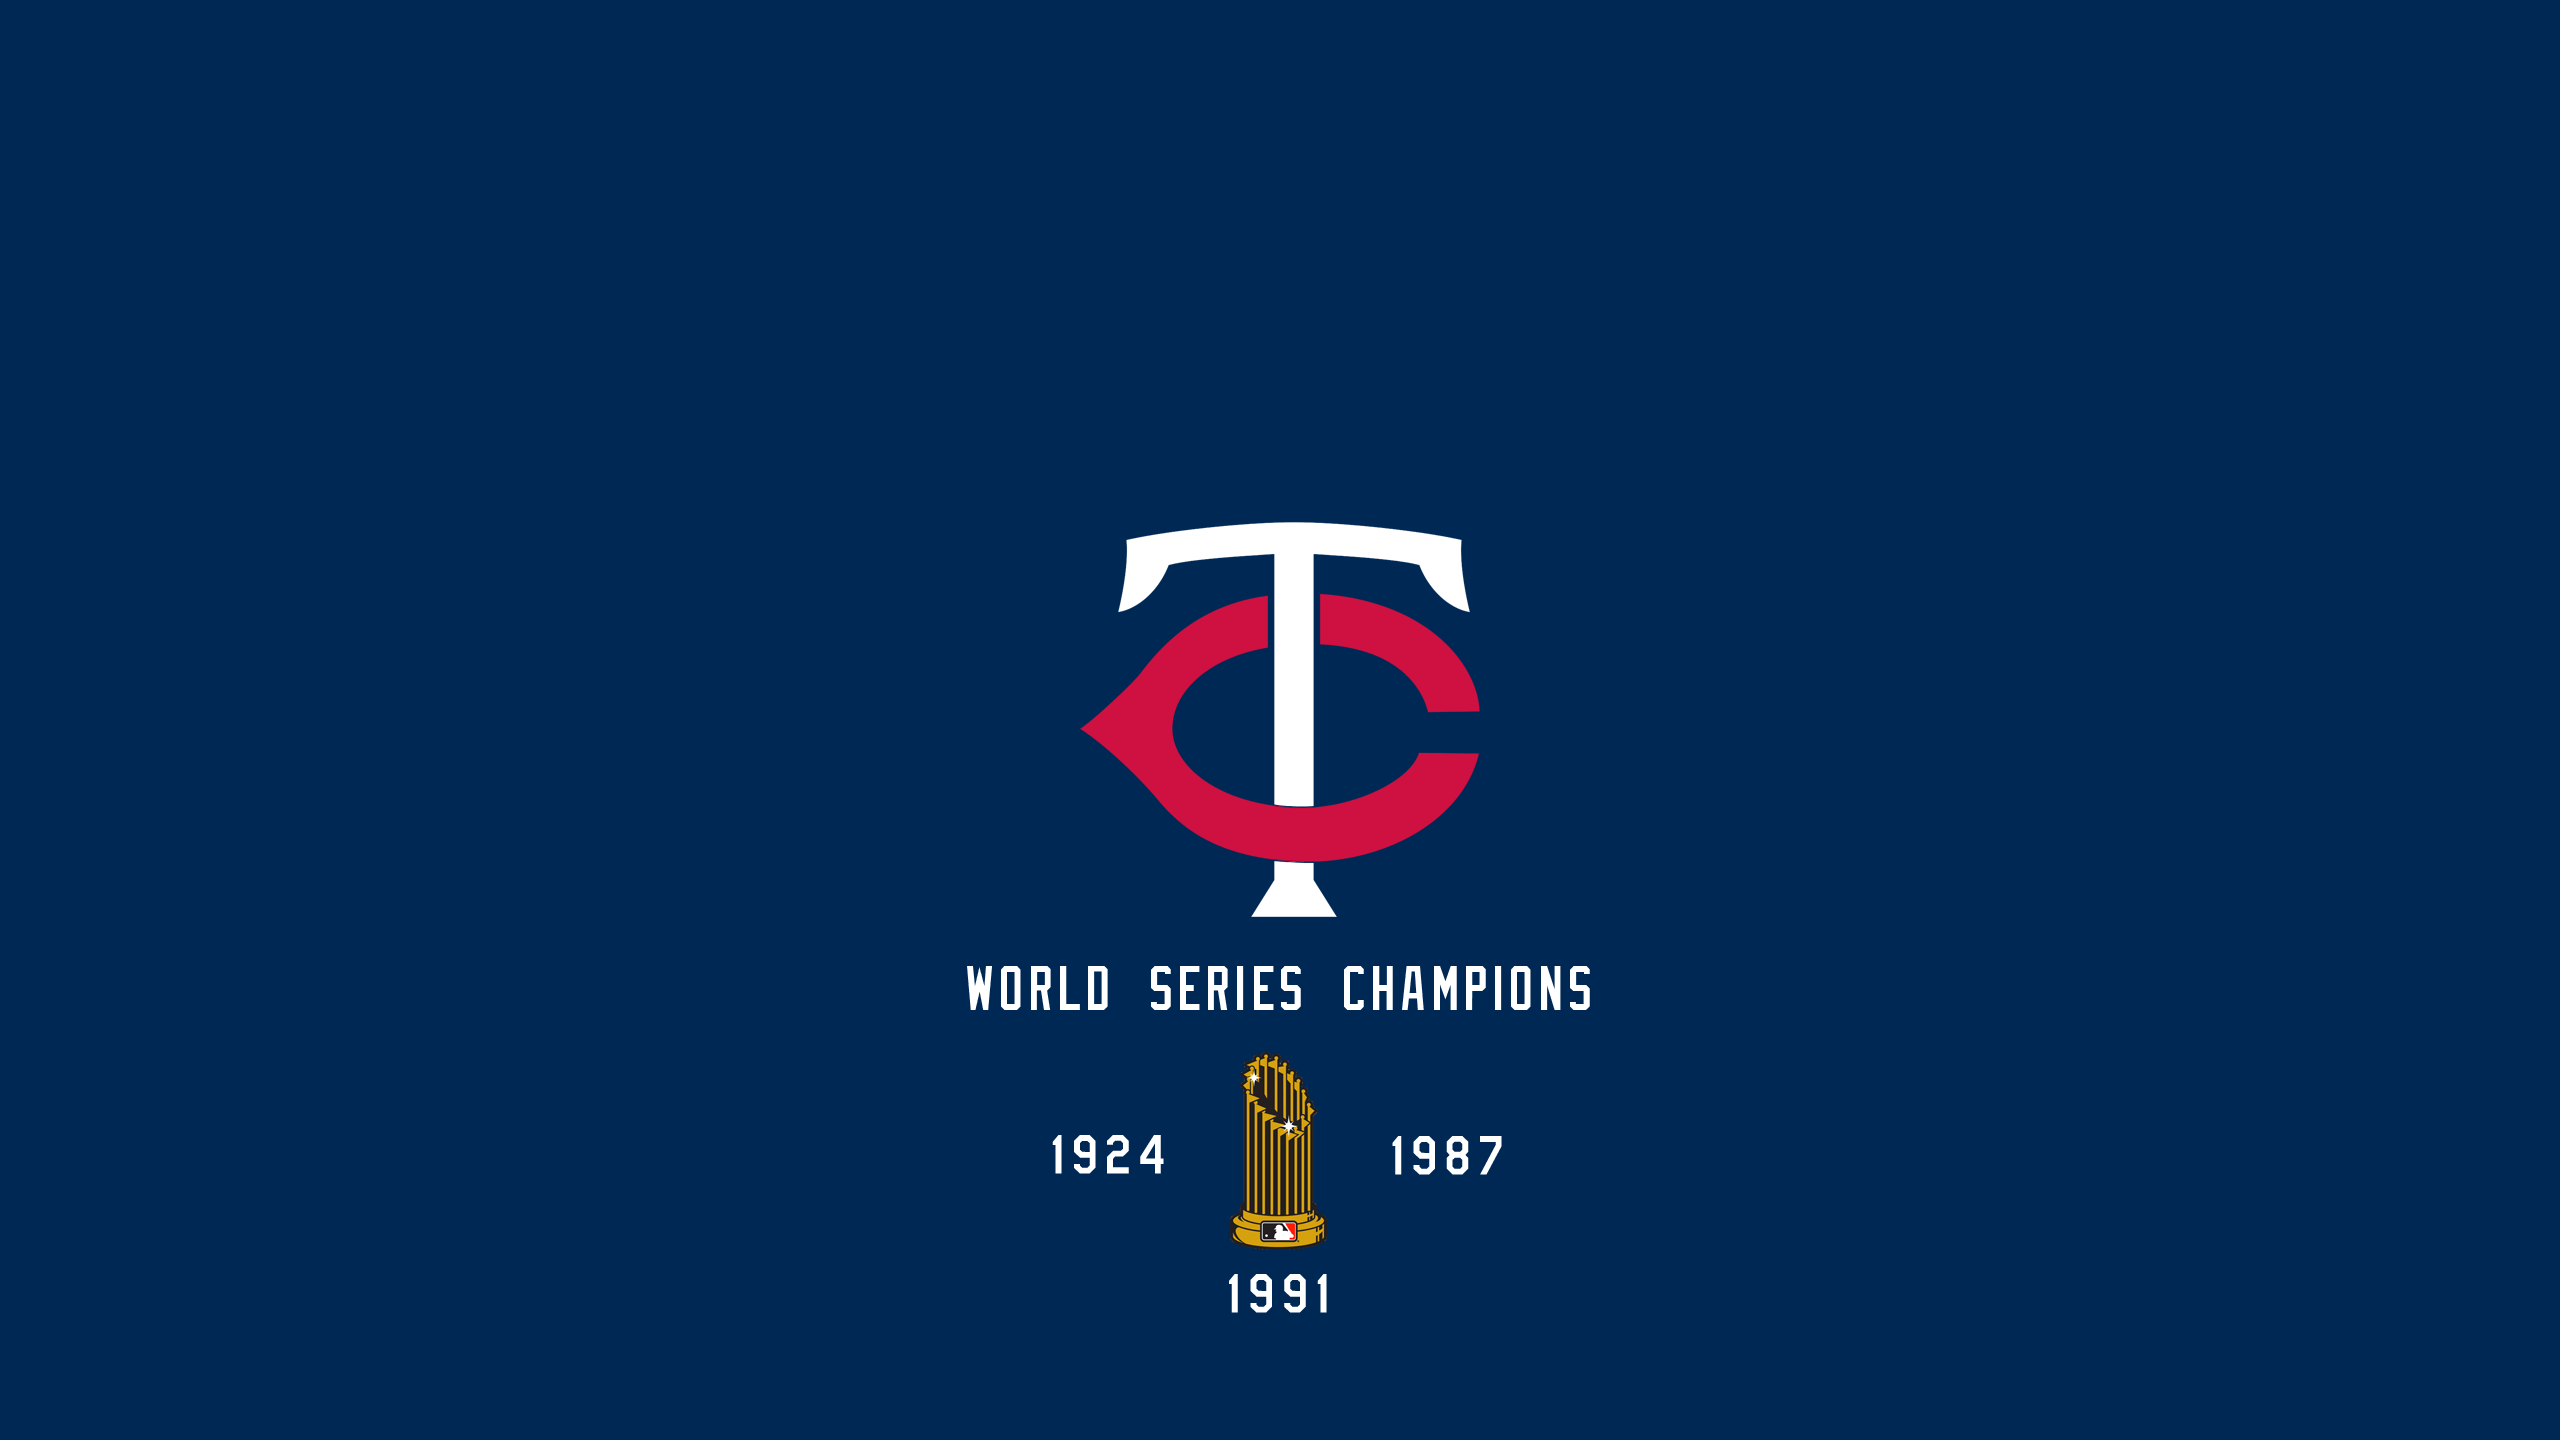 Minnesota Twins - World Series Champs